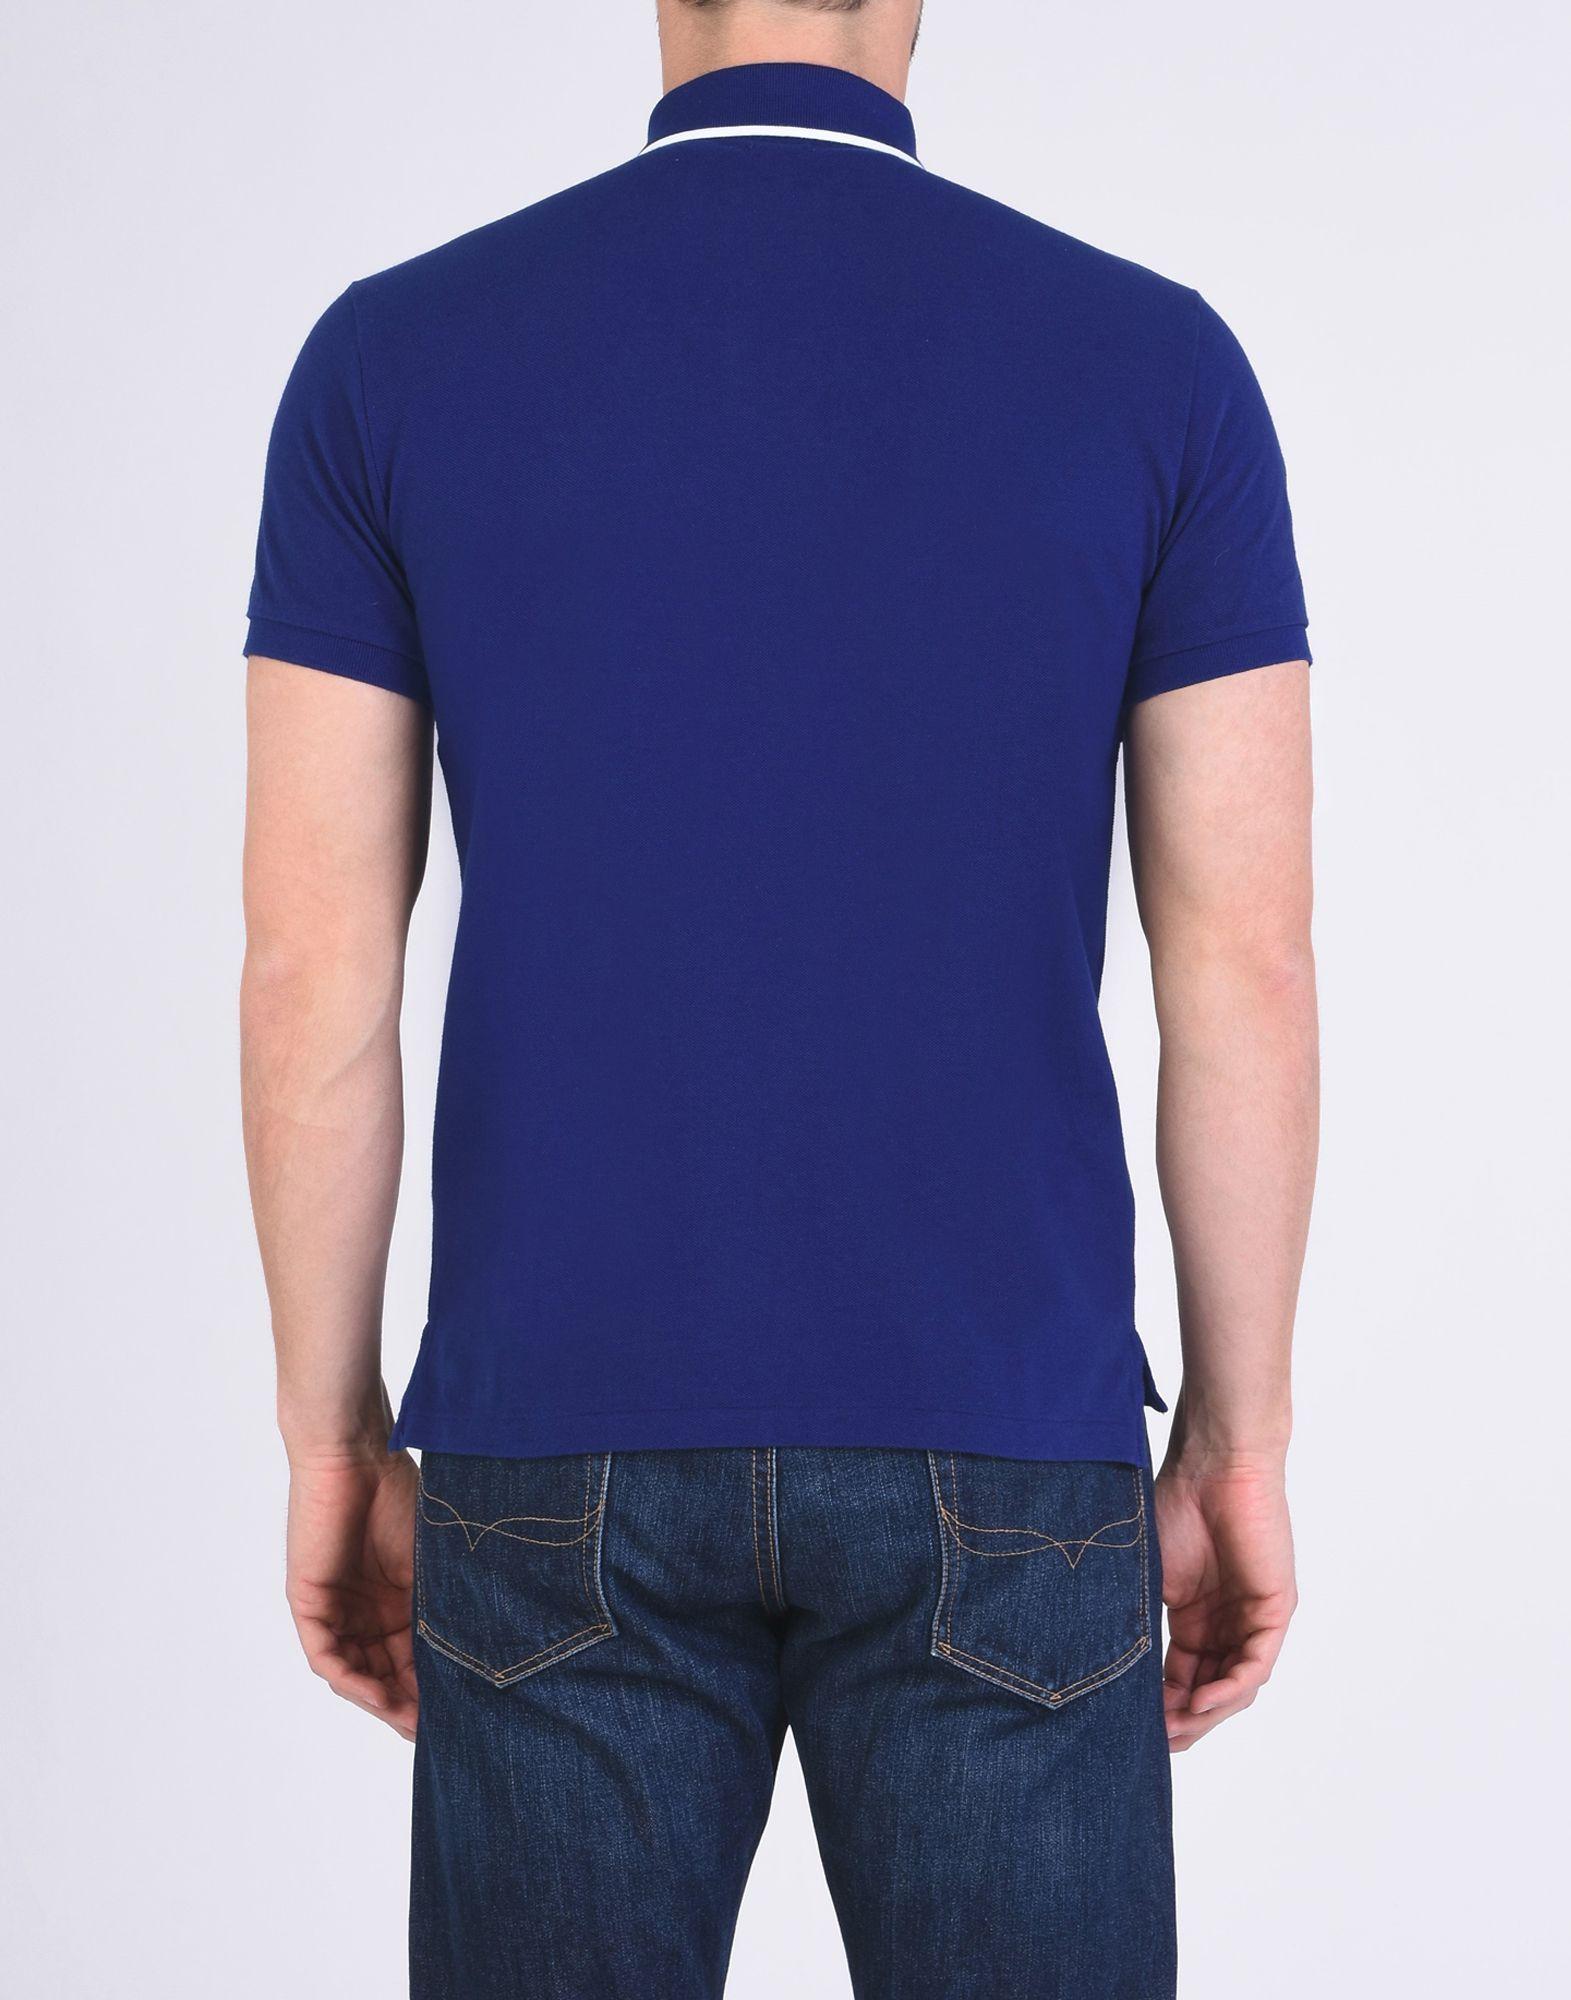 TOPWEAR Polo Ralph Lauren Bright blue Man Cotton